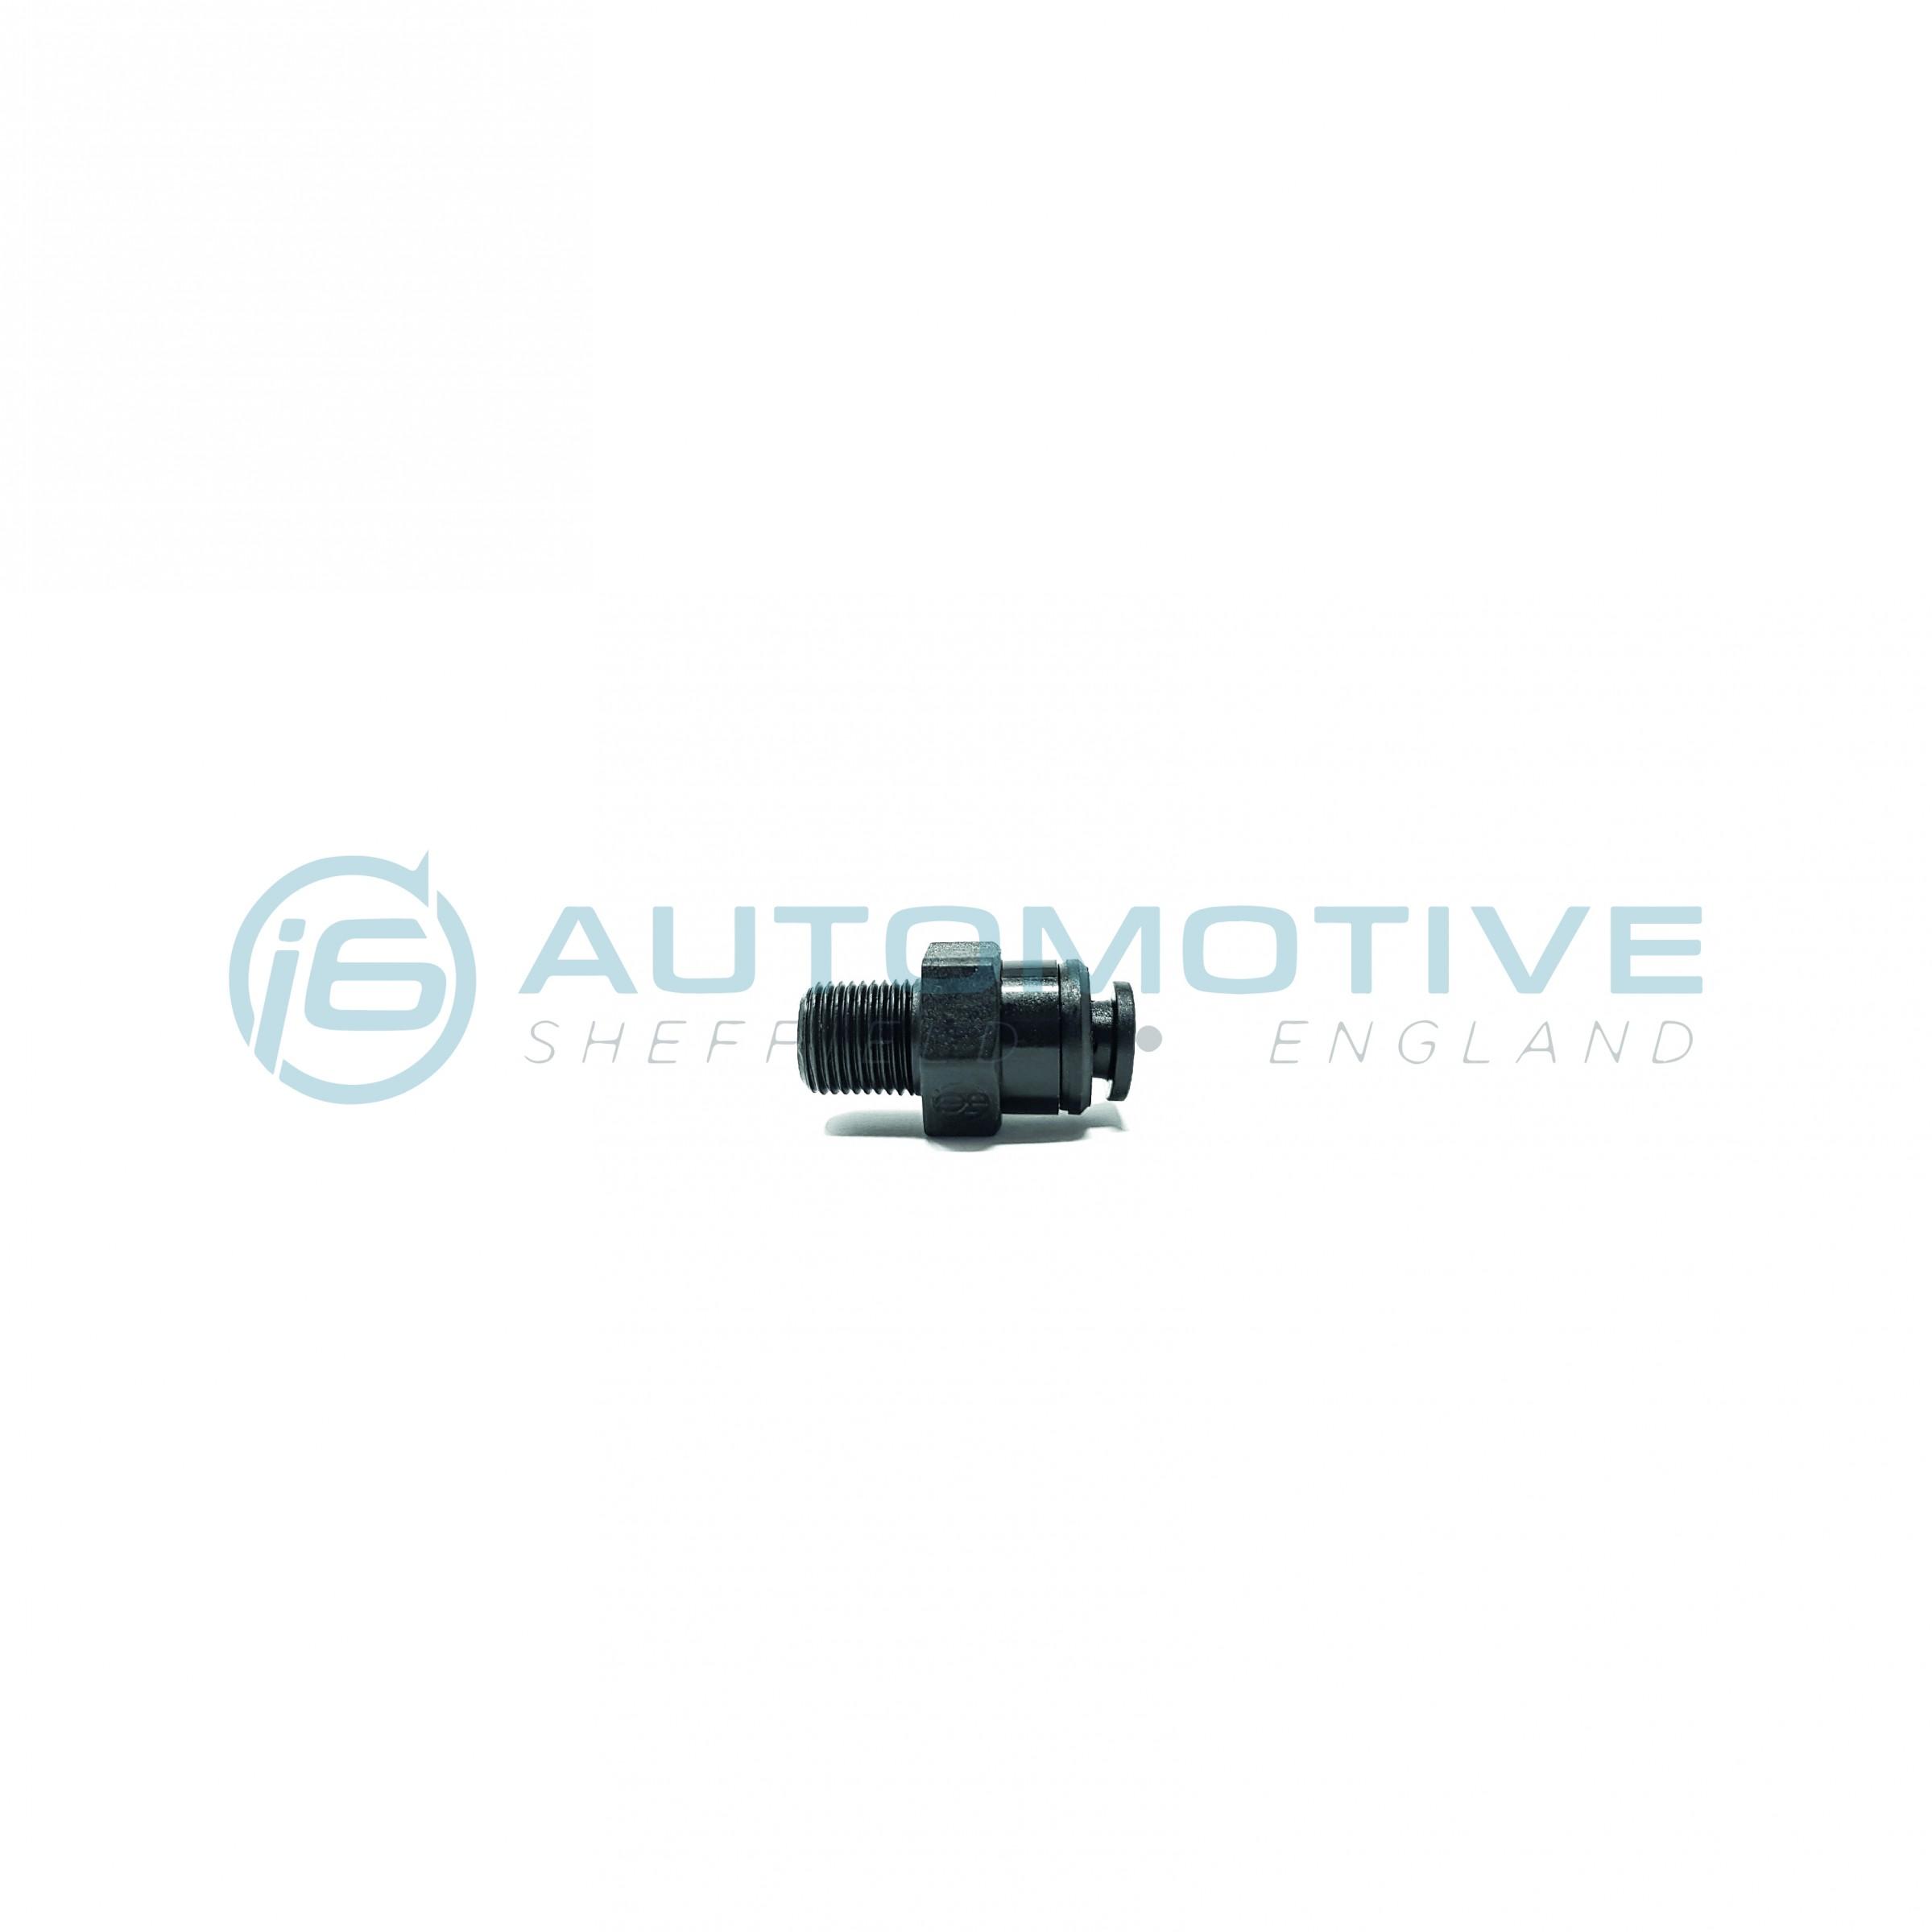 dryer audi rover landrover compressor suspension air land avant